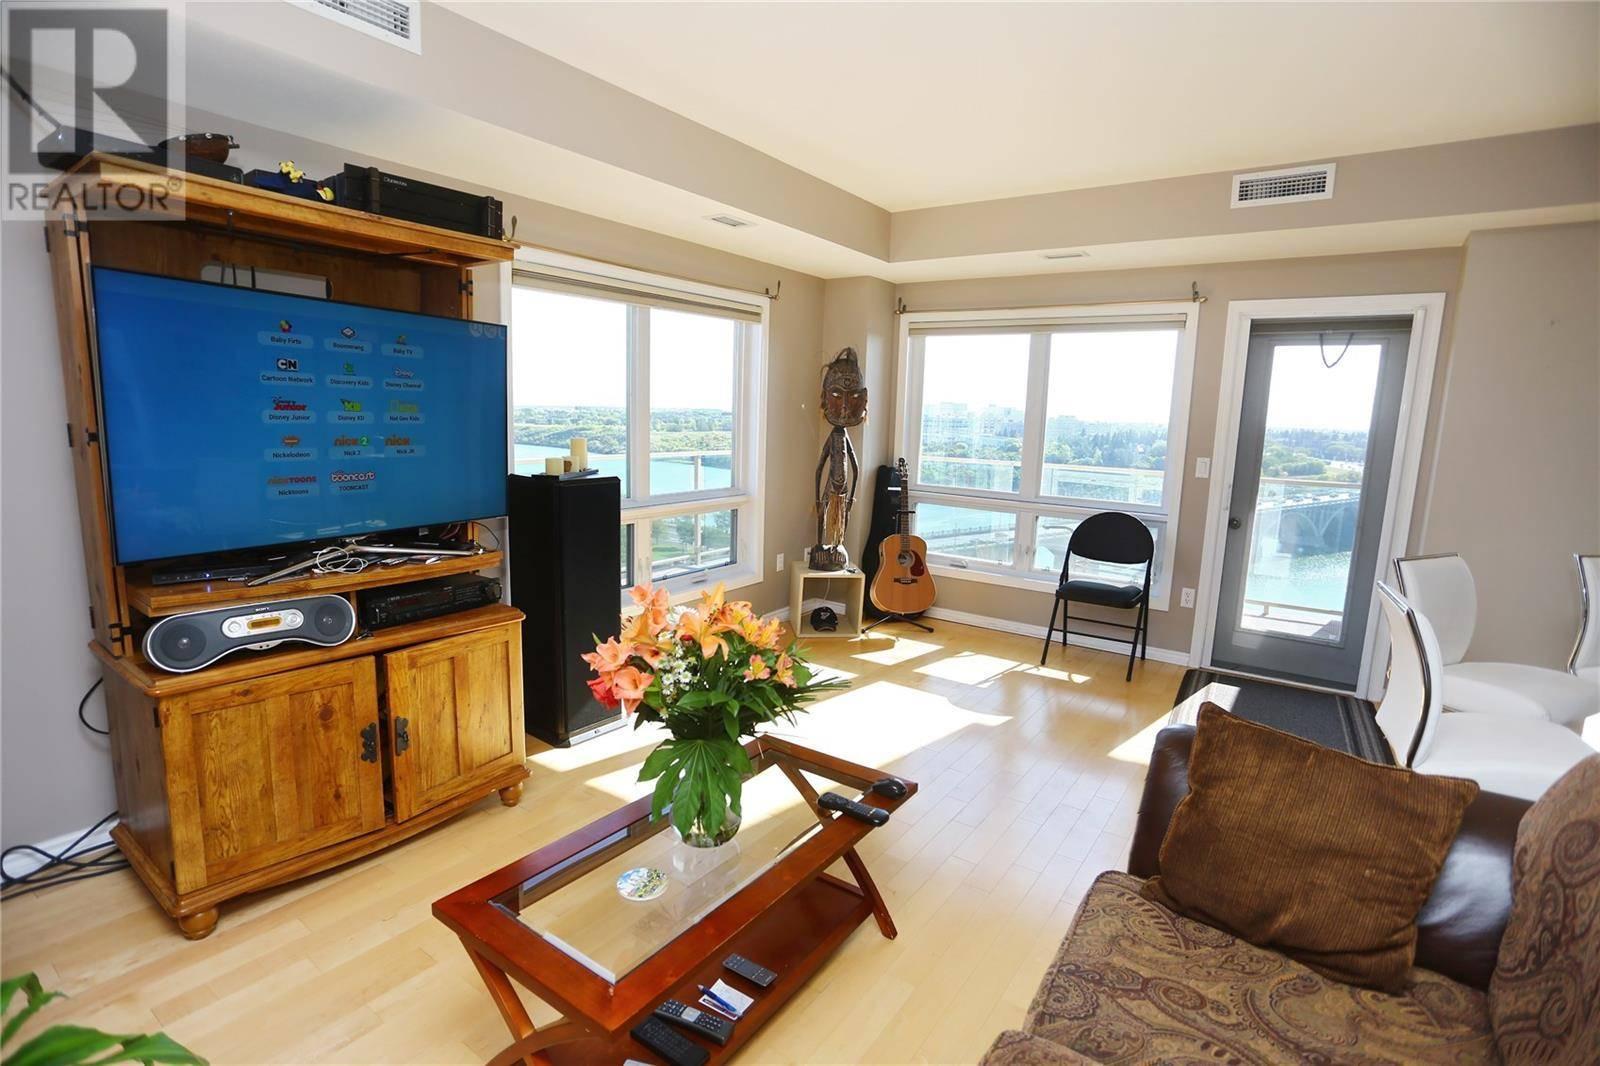 Condo for sale at 902 Spadina Cres E Unit 1407 Saskatoon Saskatchewan - MLS: SK786708